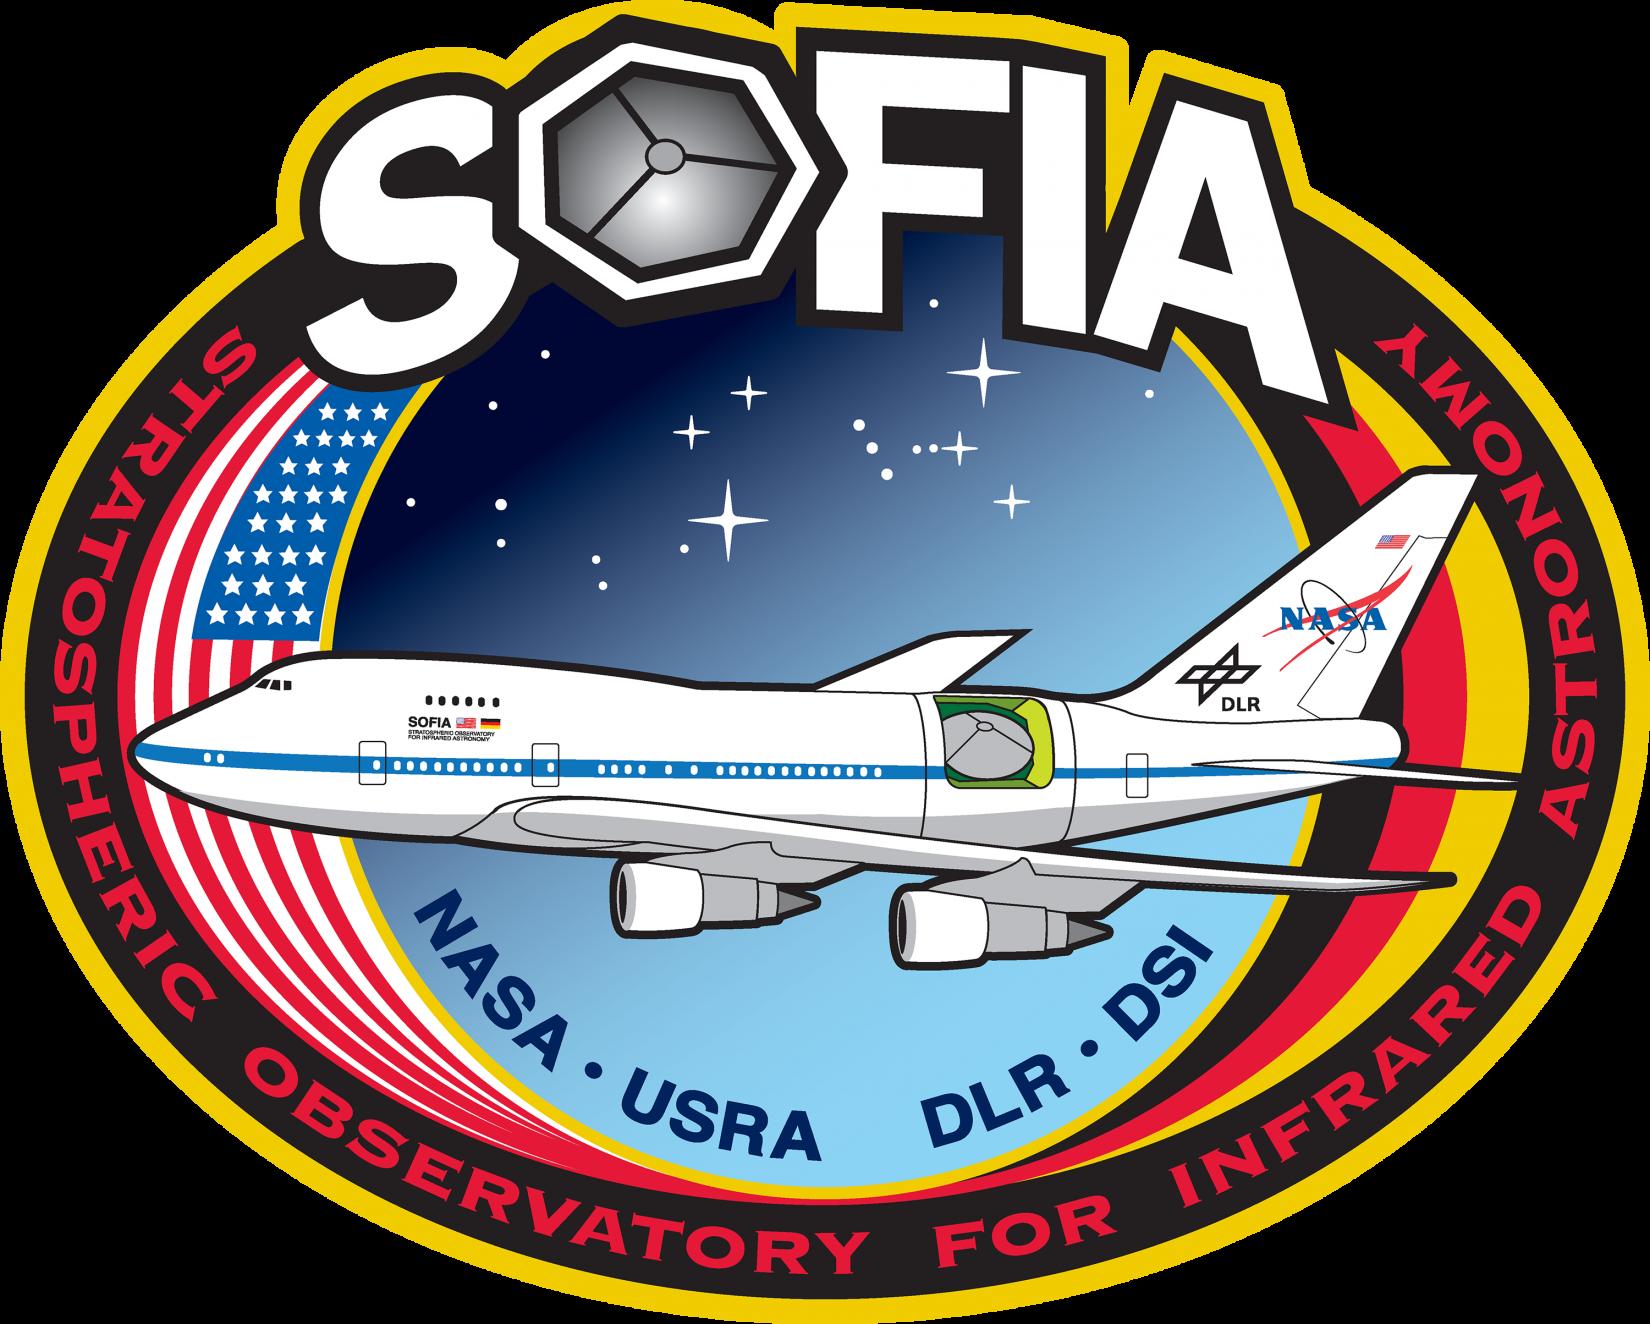 SOFIA Mission patch